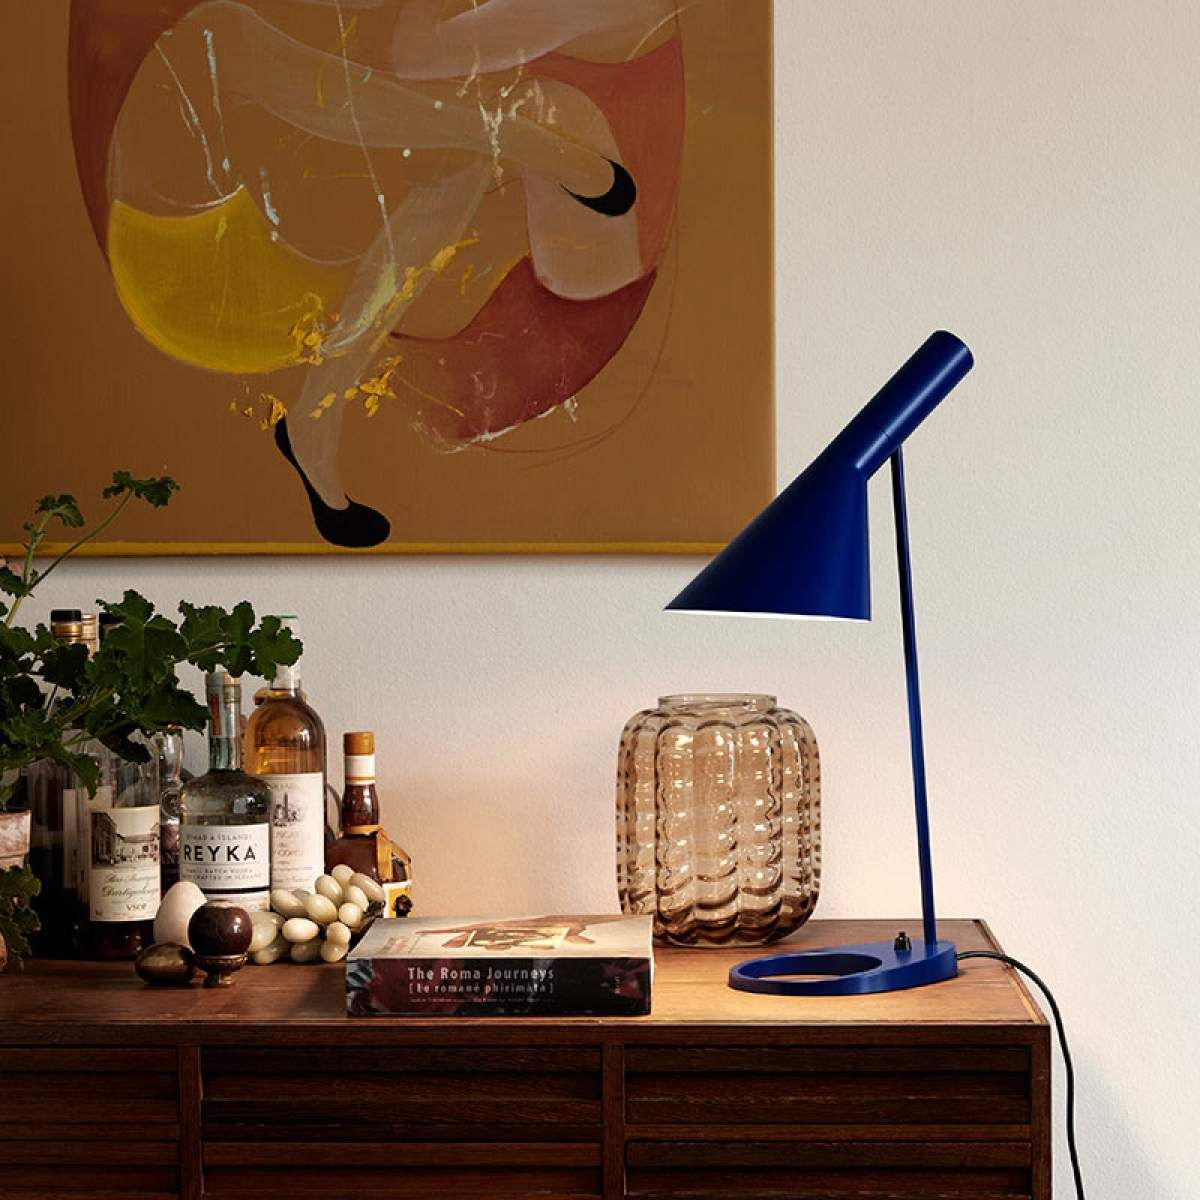 louis poulsen aj lampe poser design bleuelampe. Black Bedroom Furniture Sets. Home Design Ideas